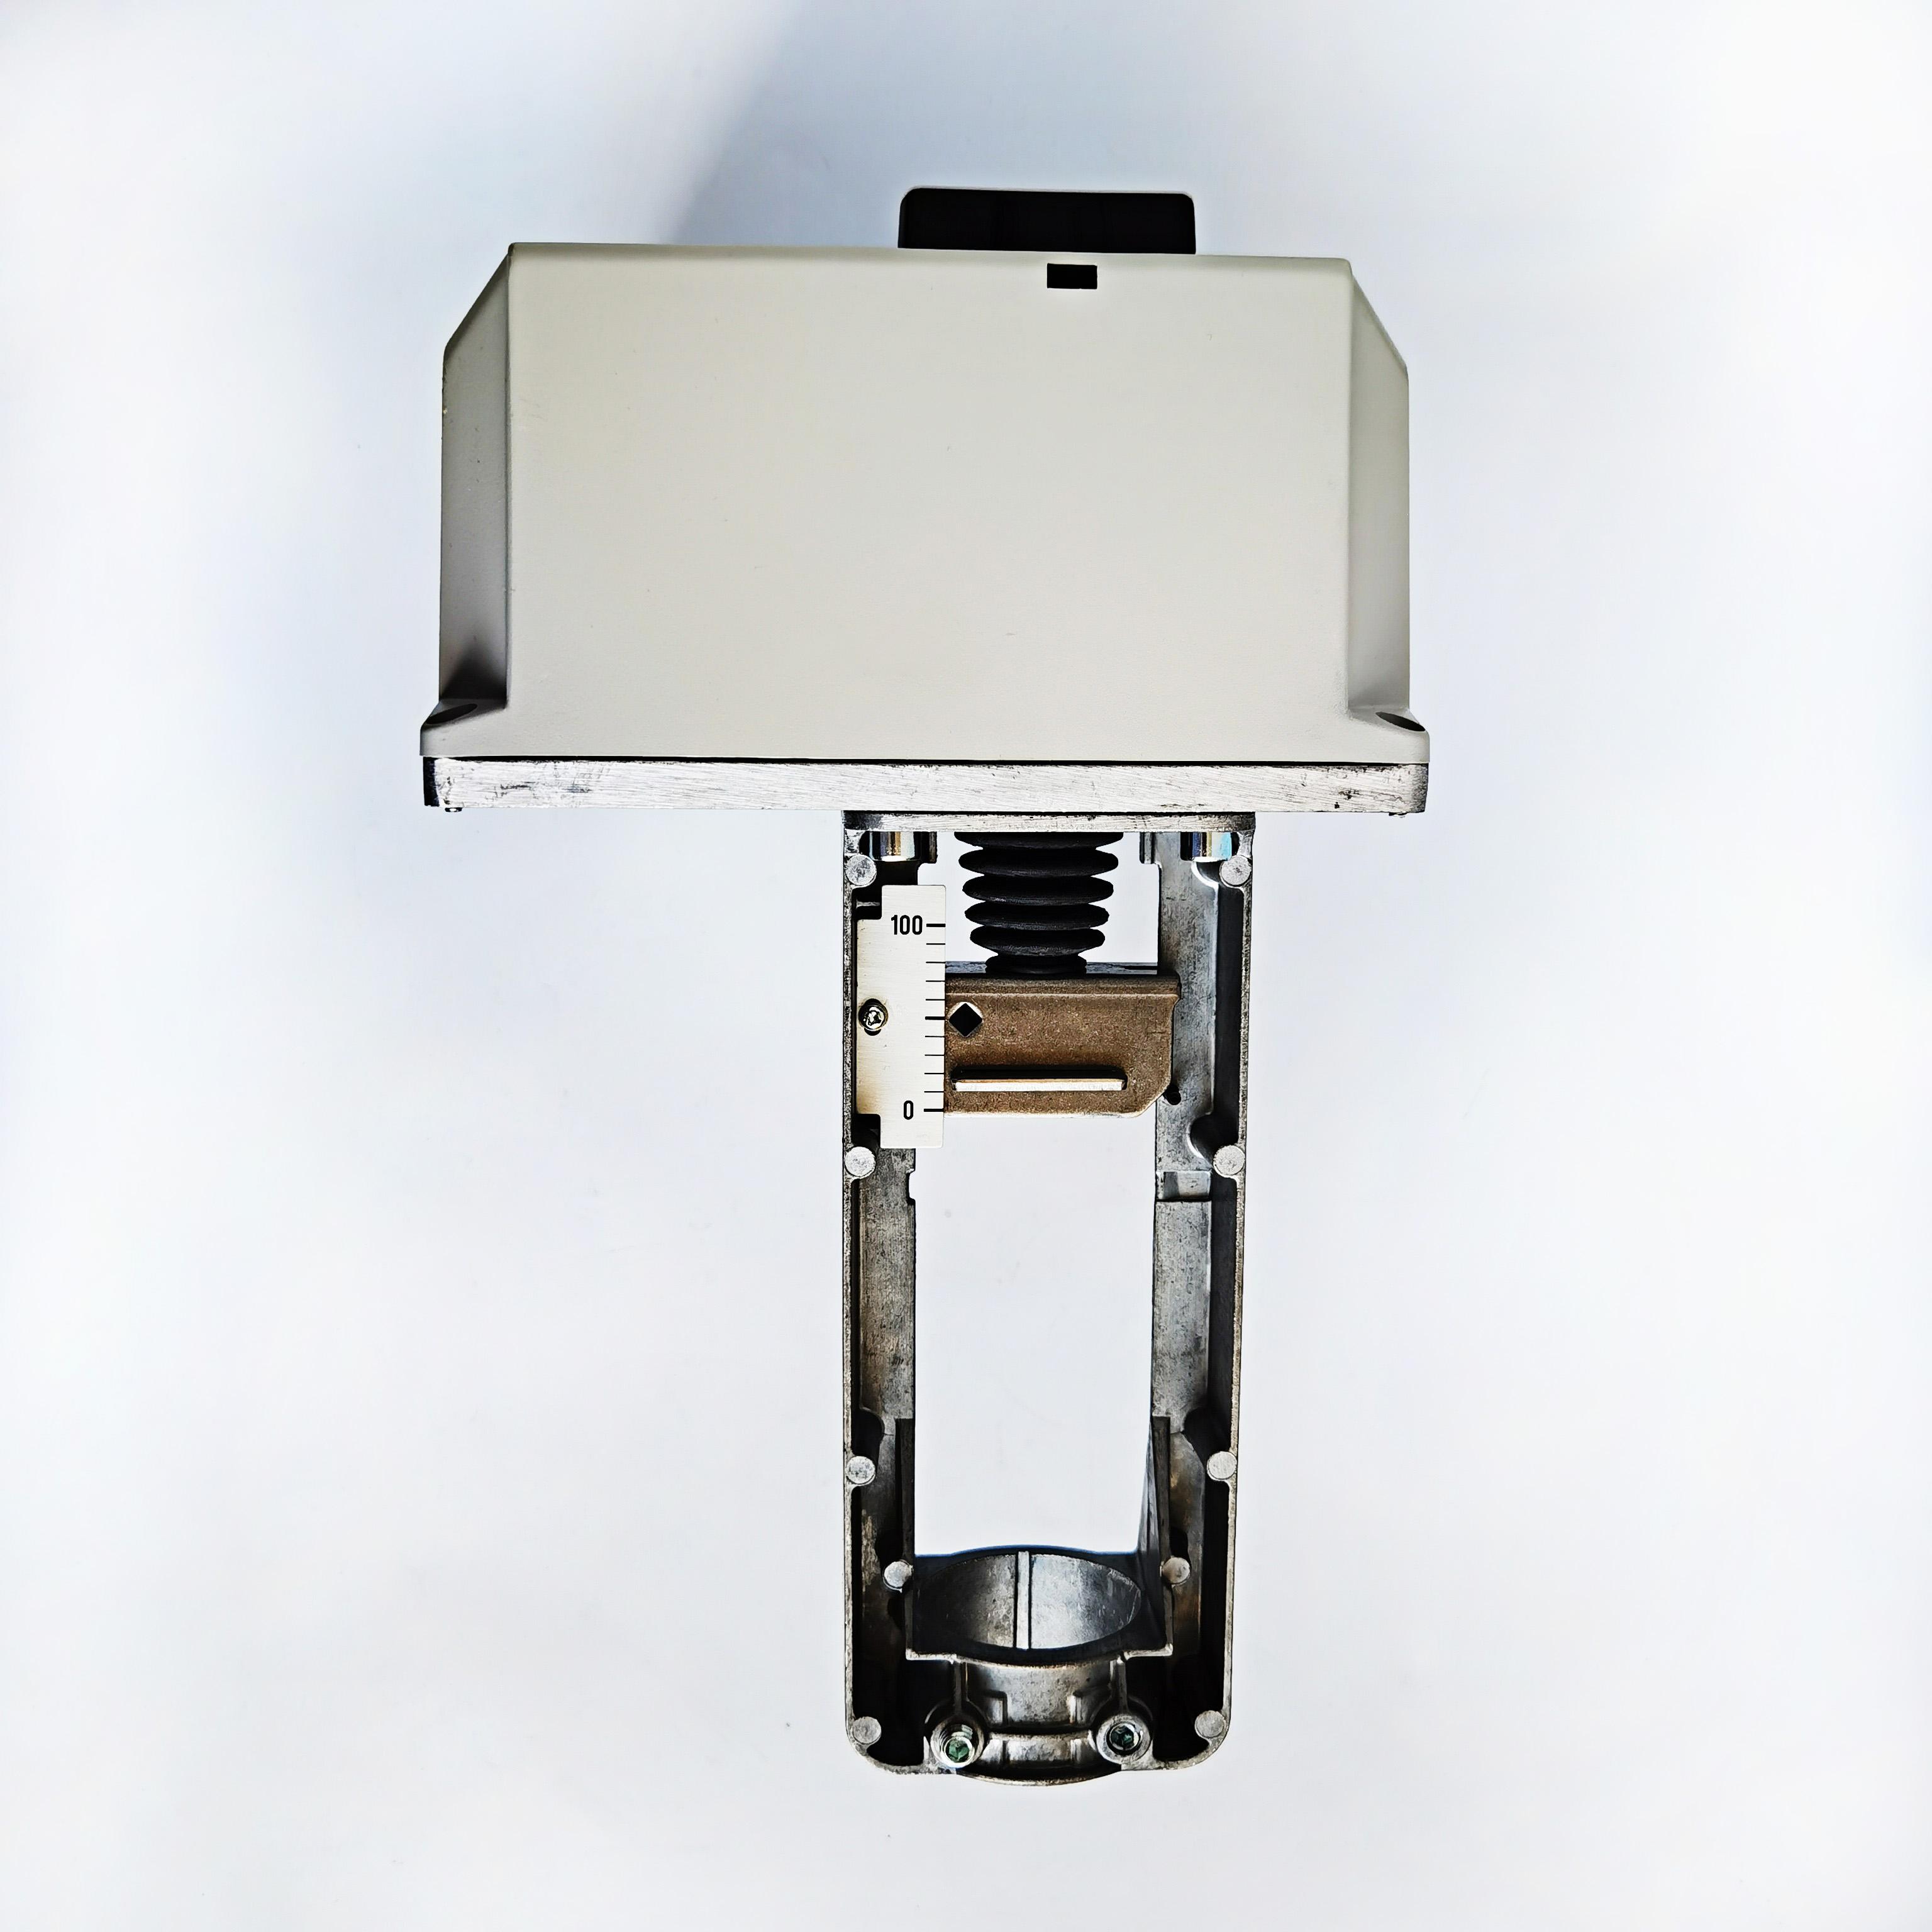 V5216A1094 霍尼韦尔电动二通阀执行器